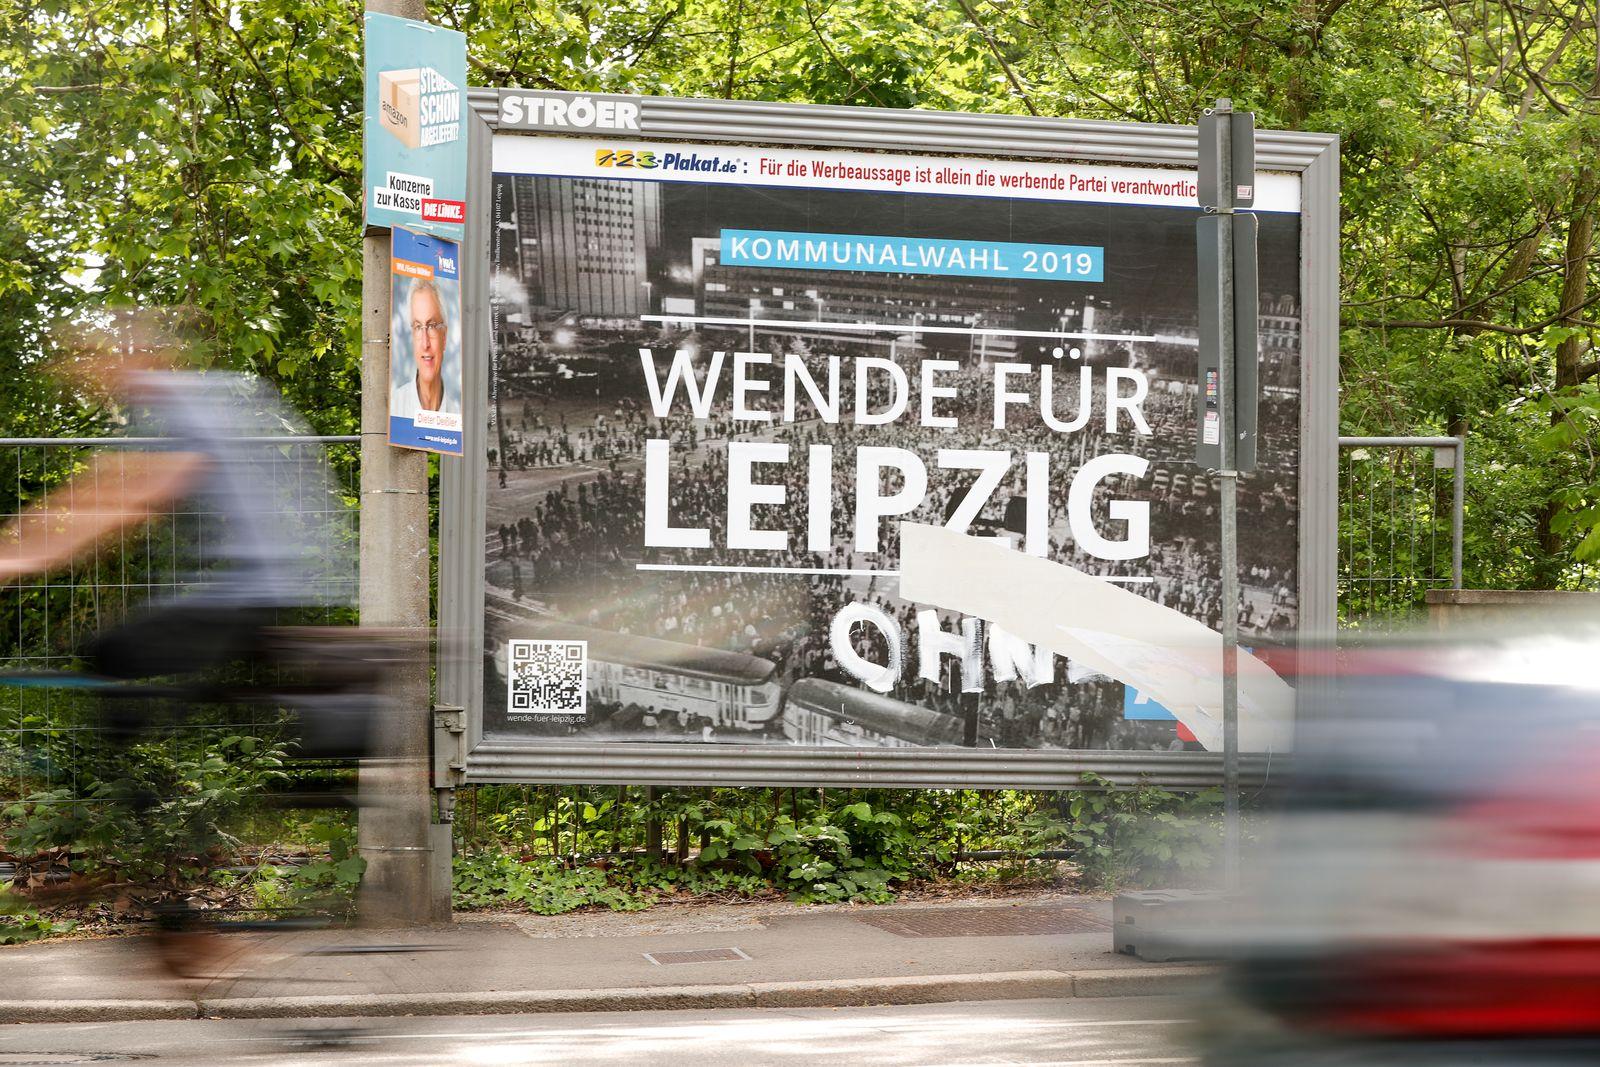 Fotografen-Familie kritisiert AfD-Wahlplakat in Leipzig